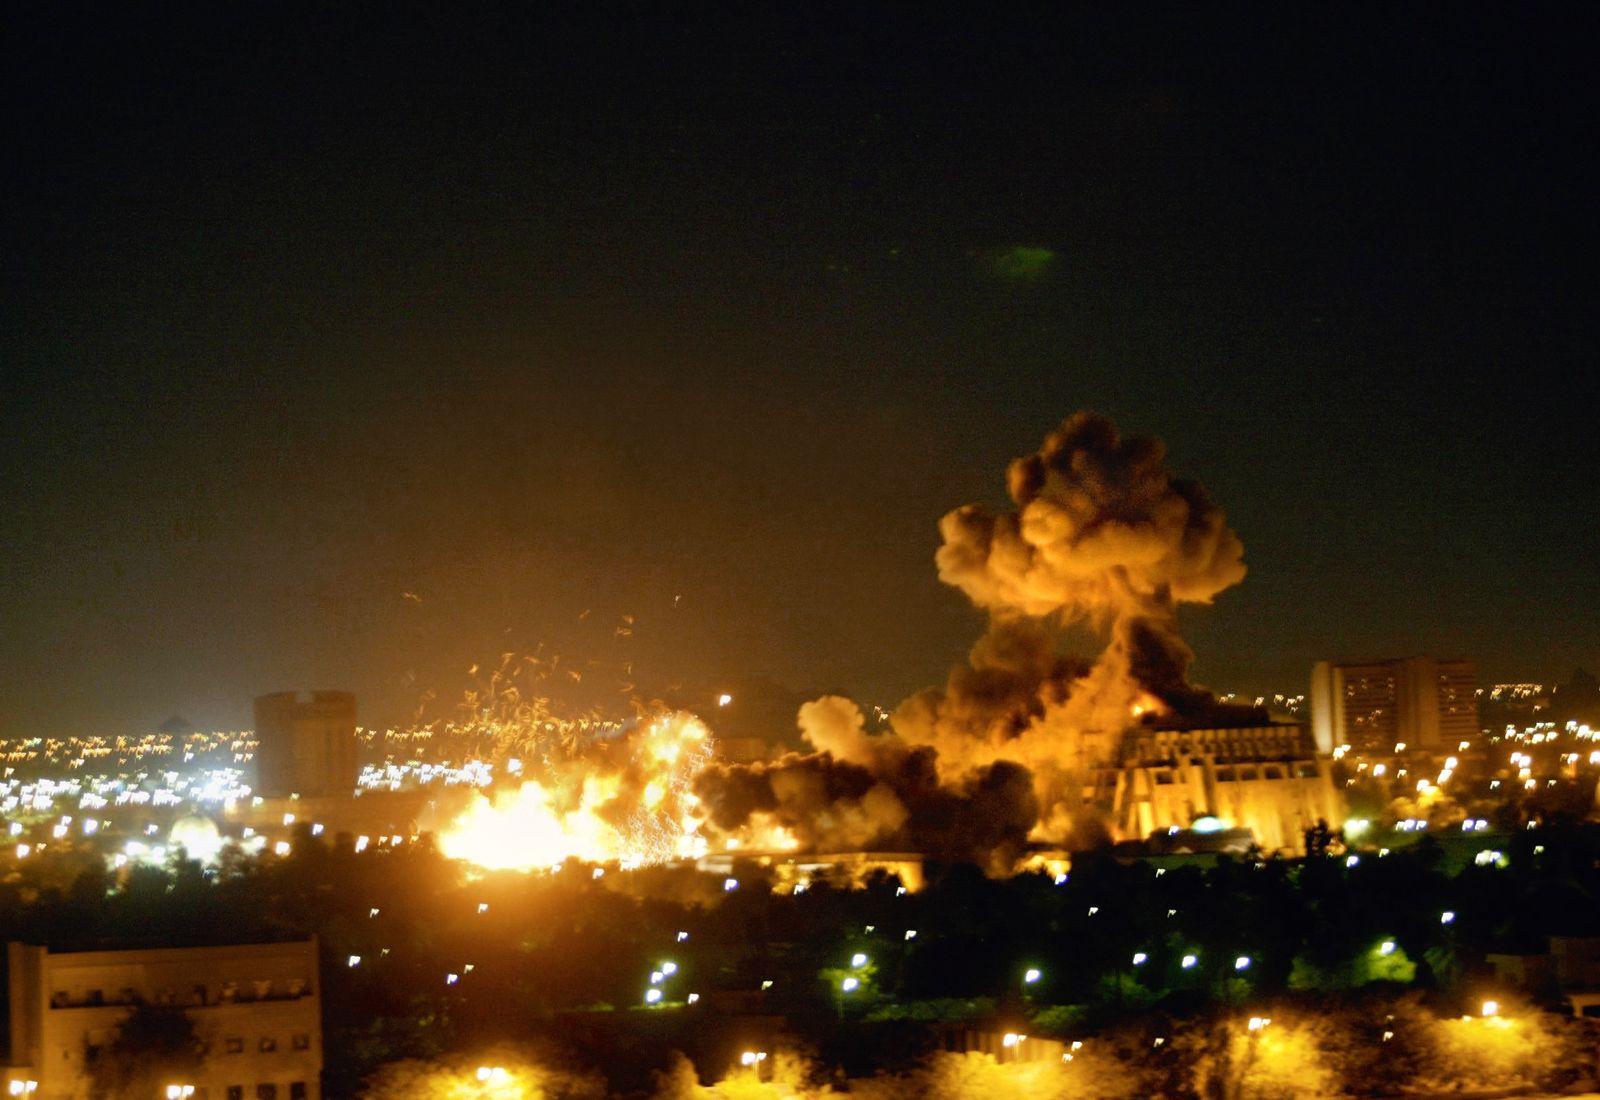 Irak / Irakkrieg / Bombe / Explosion / Bombardement / 2000er Jahre #13